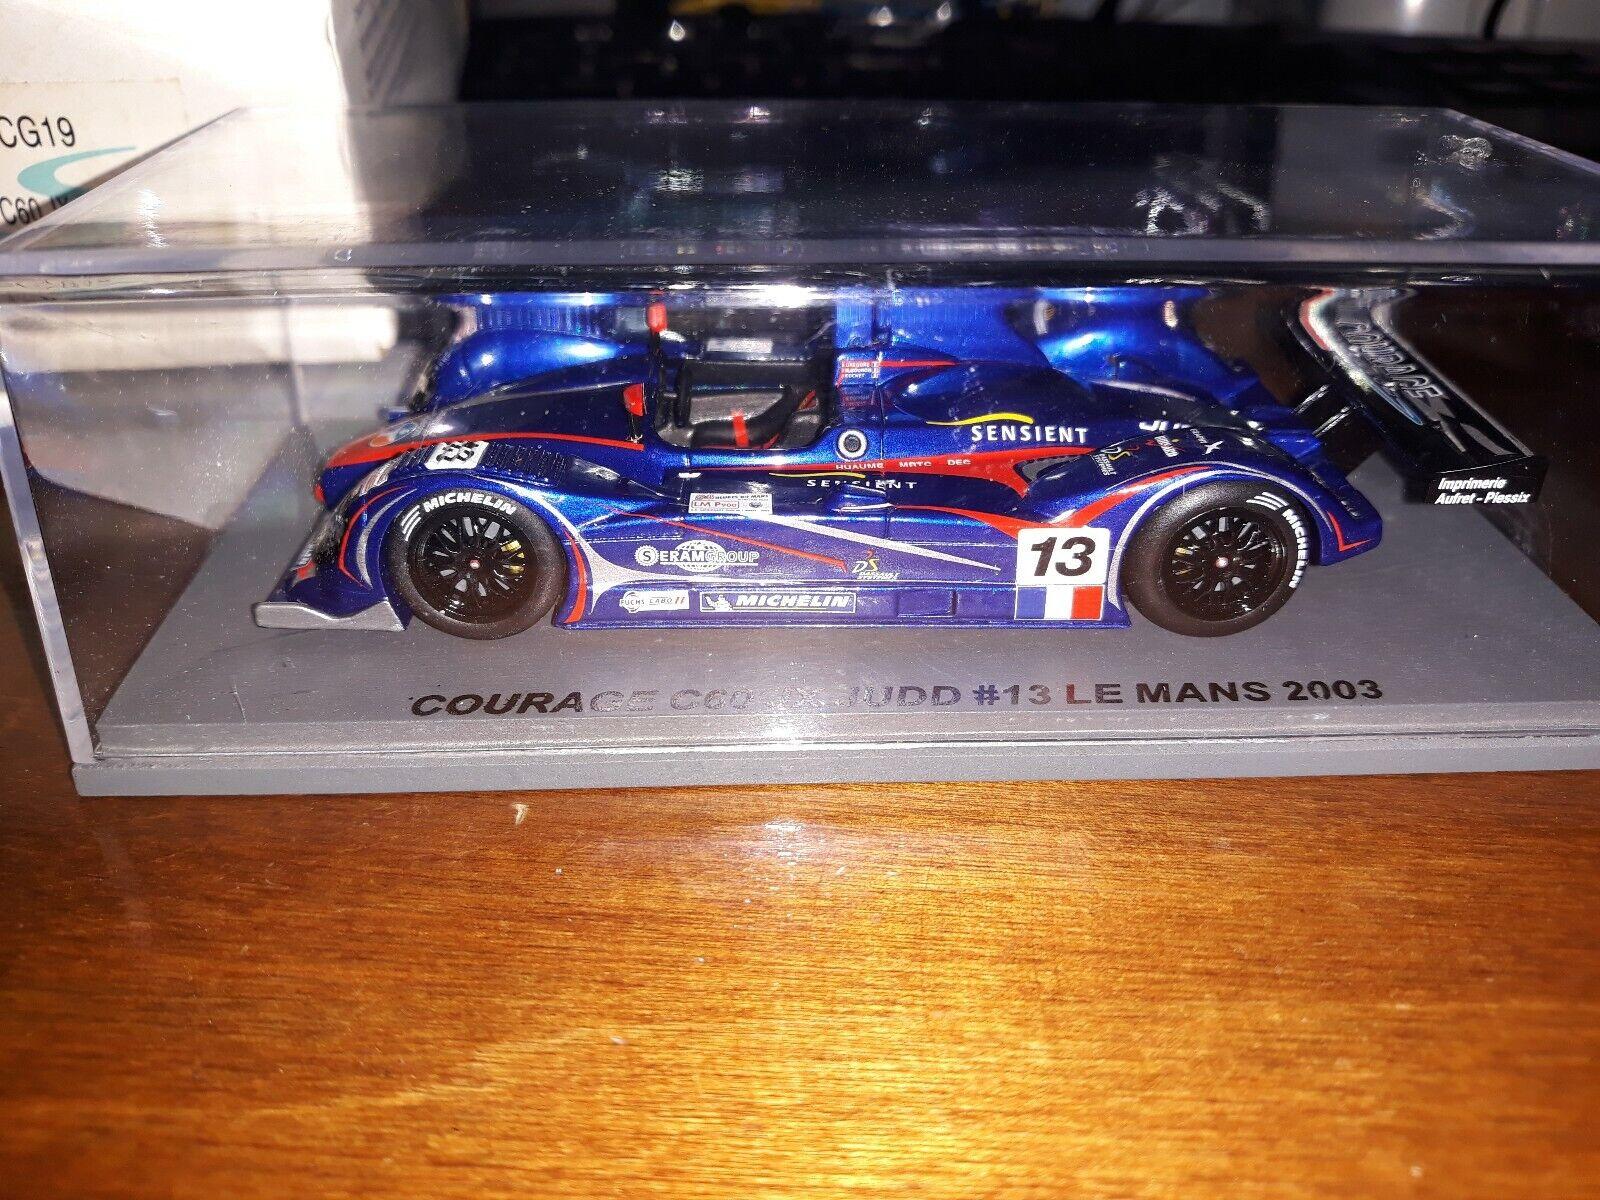 Spark  Courage C60 JX Judd  13 Le Mans 2003 SCCG19